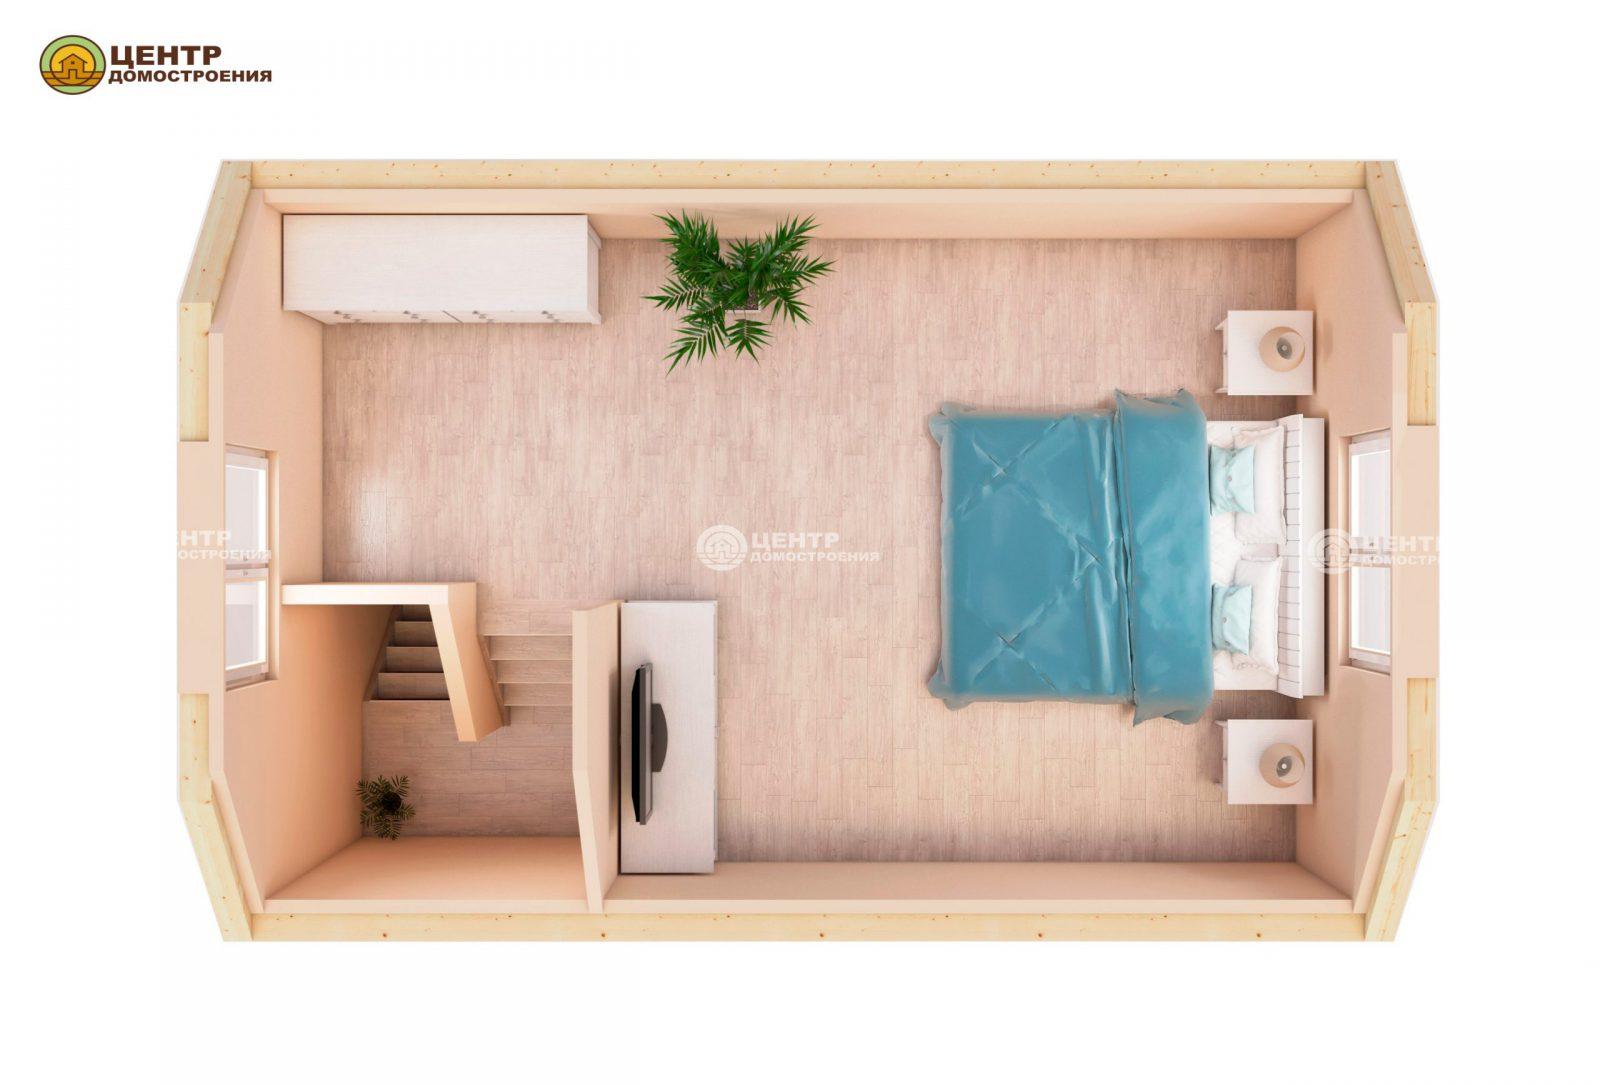 Проект дома 6 на 4 с мансардой